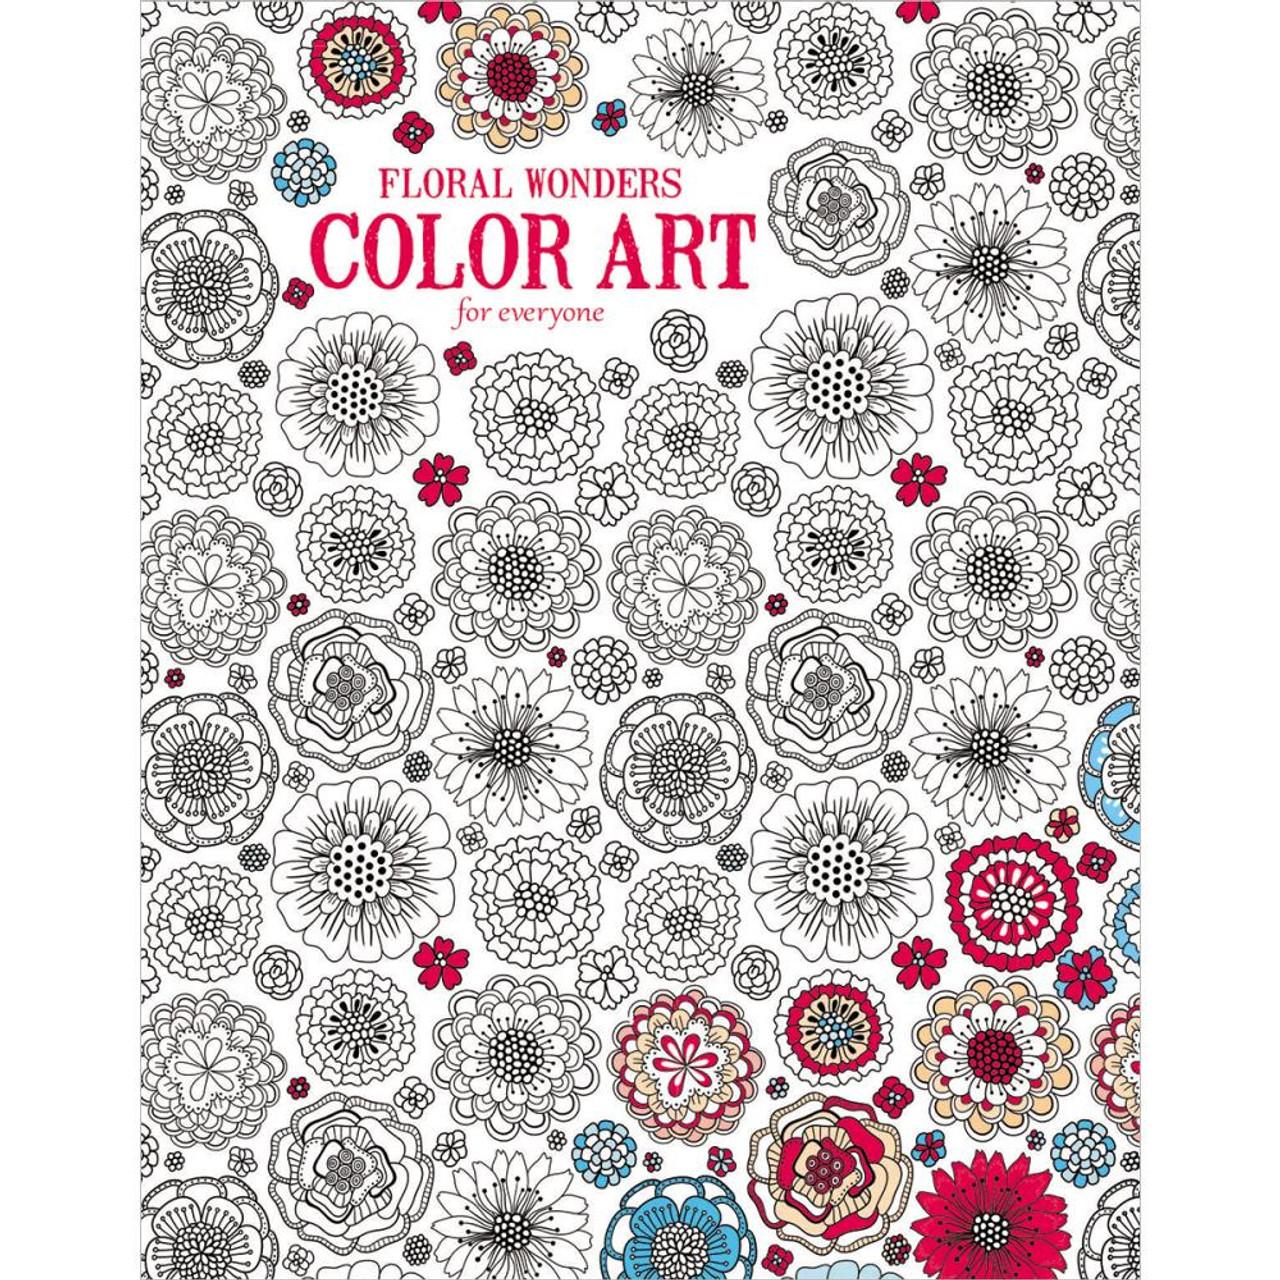 Zendoodle coloring enchanting gardens - Floral Wonders Color Art For Everyone